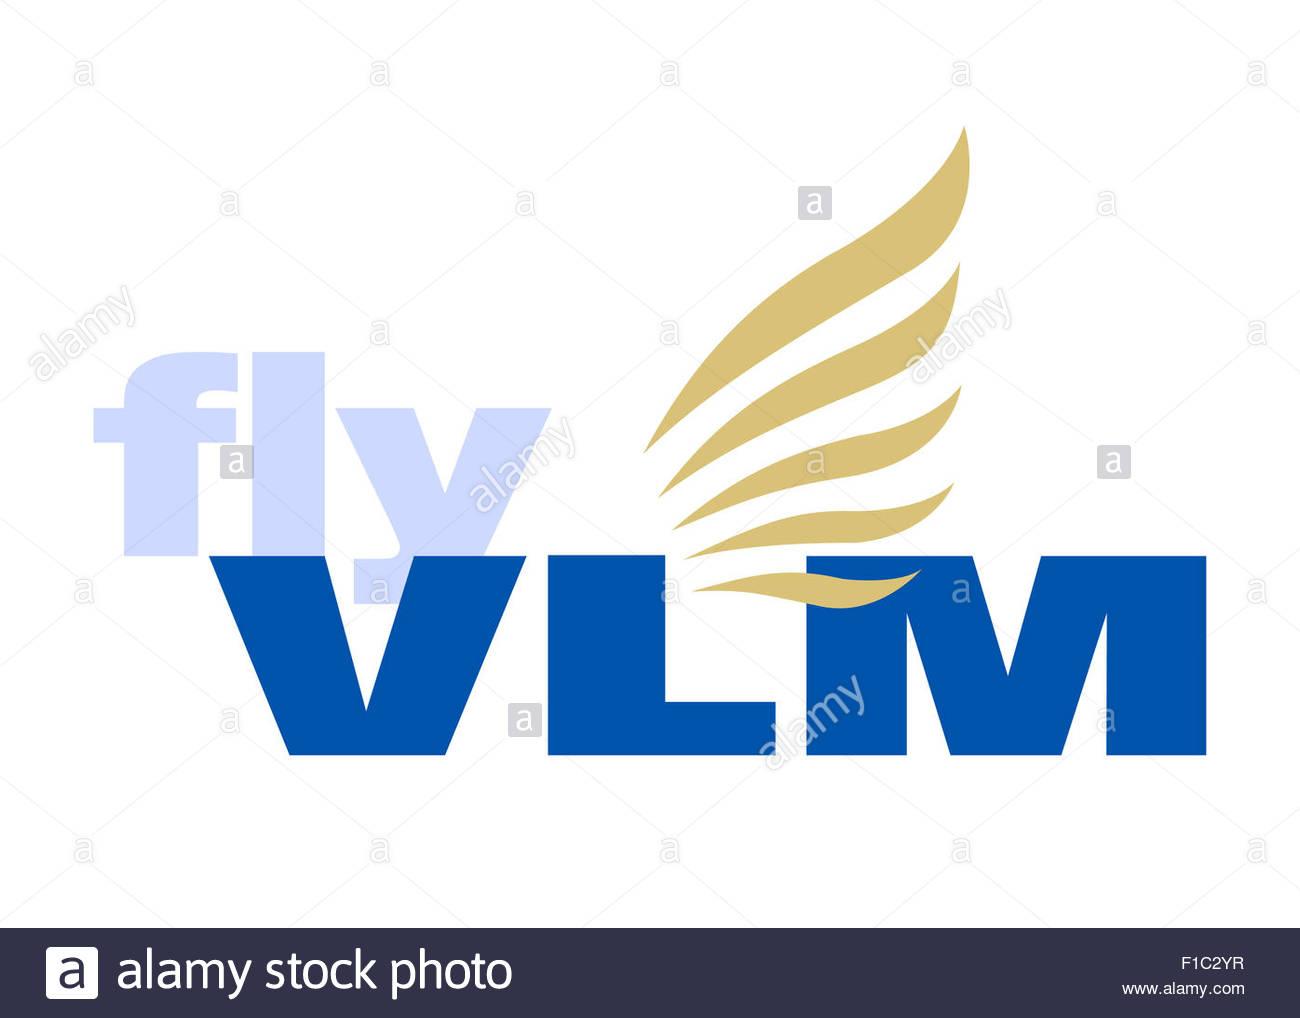 vlm fly airlines logo icon symbol flag emblem sign stock